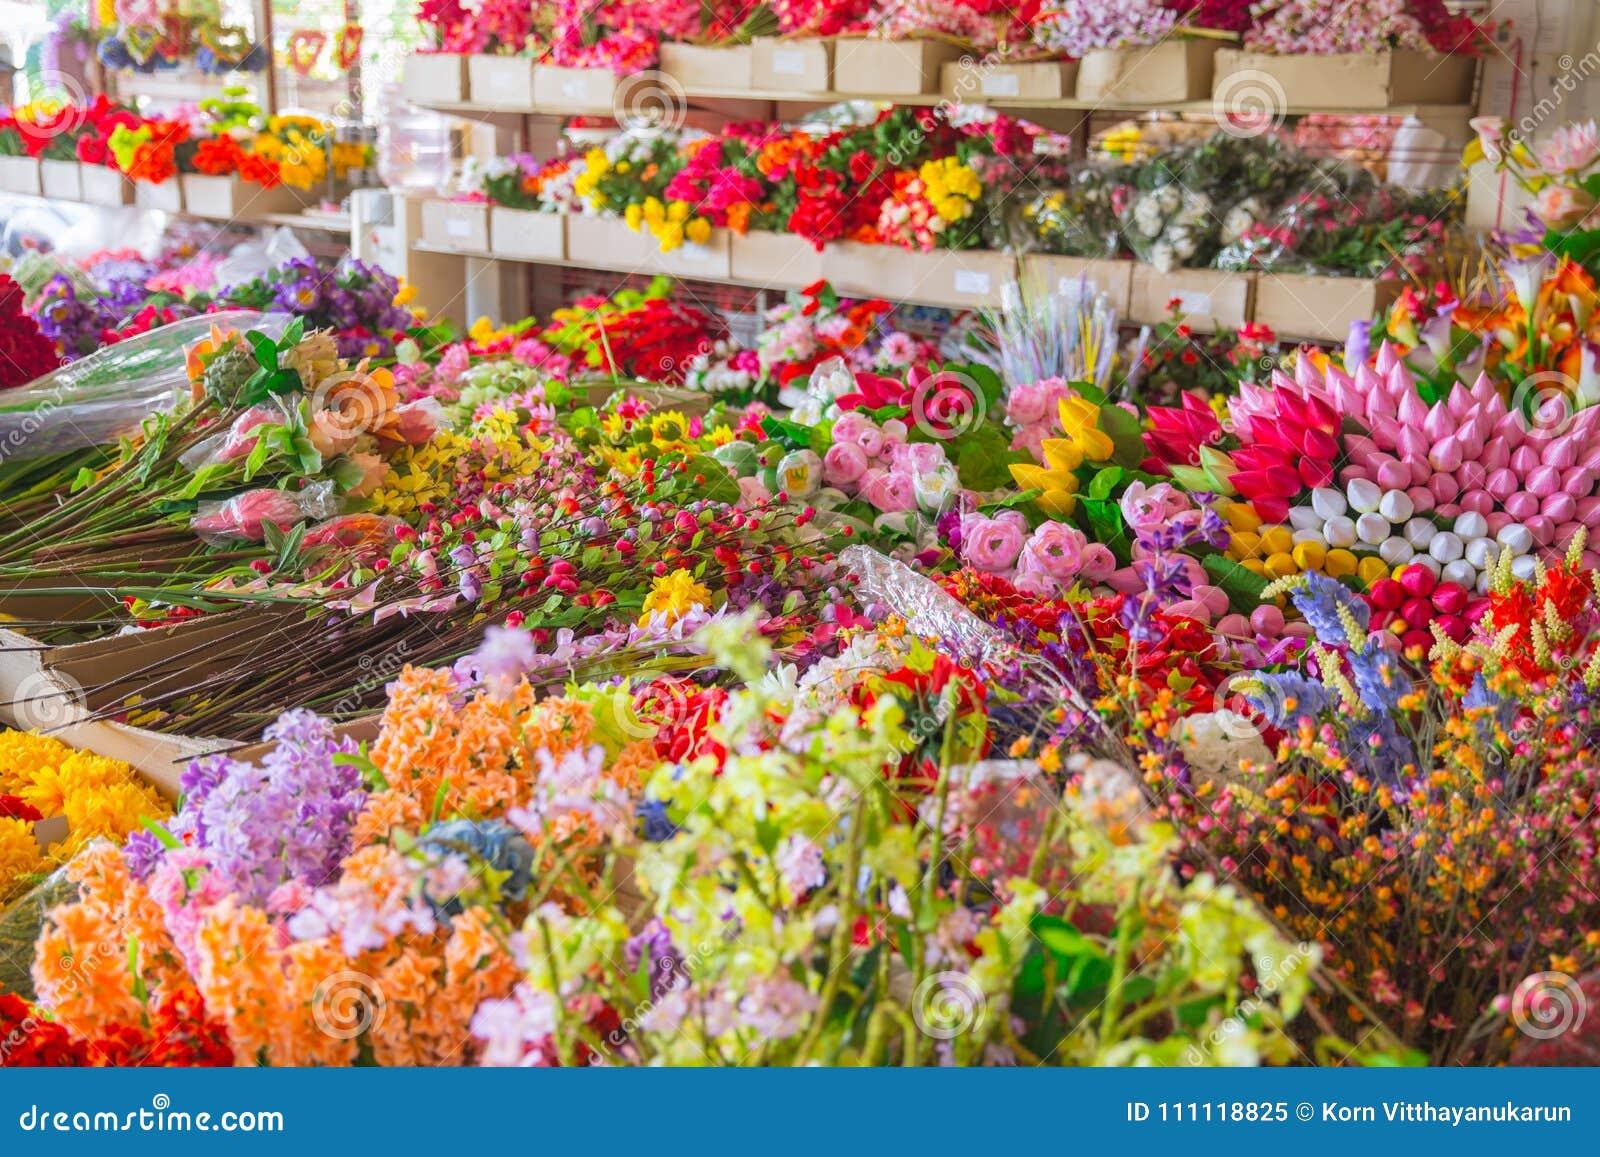 Plastic flower shop beautiful colorful fake flora stock image download plastic flower shop beautiful colorful fake flora stock image image of artificial leaf izmirmasajfo